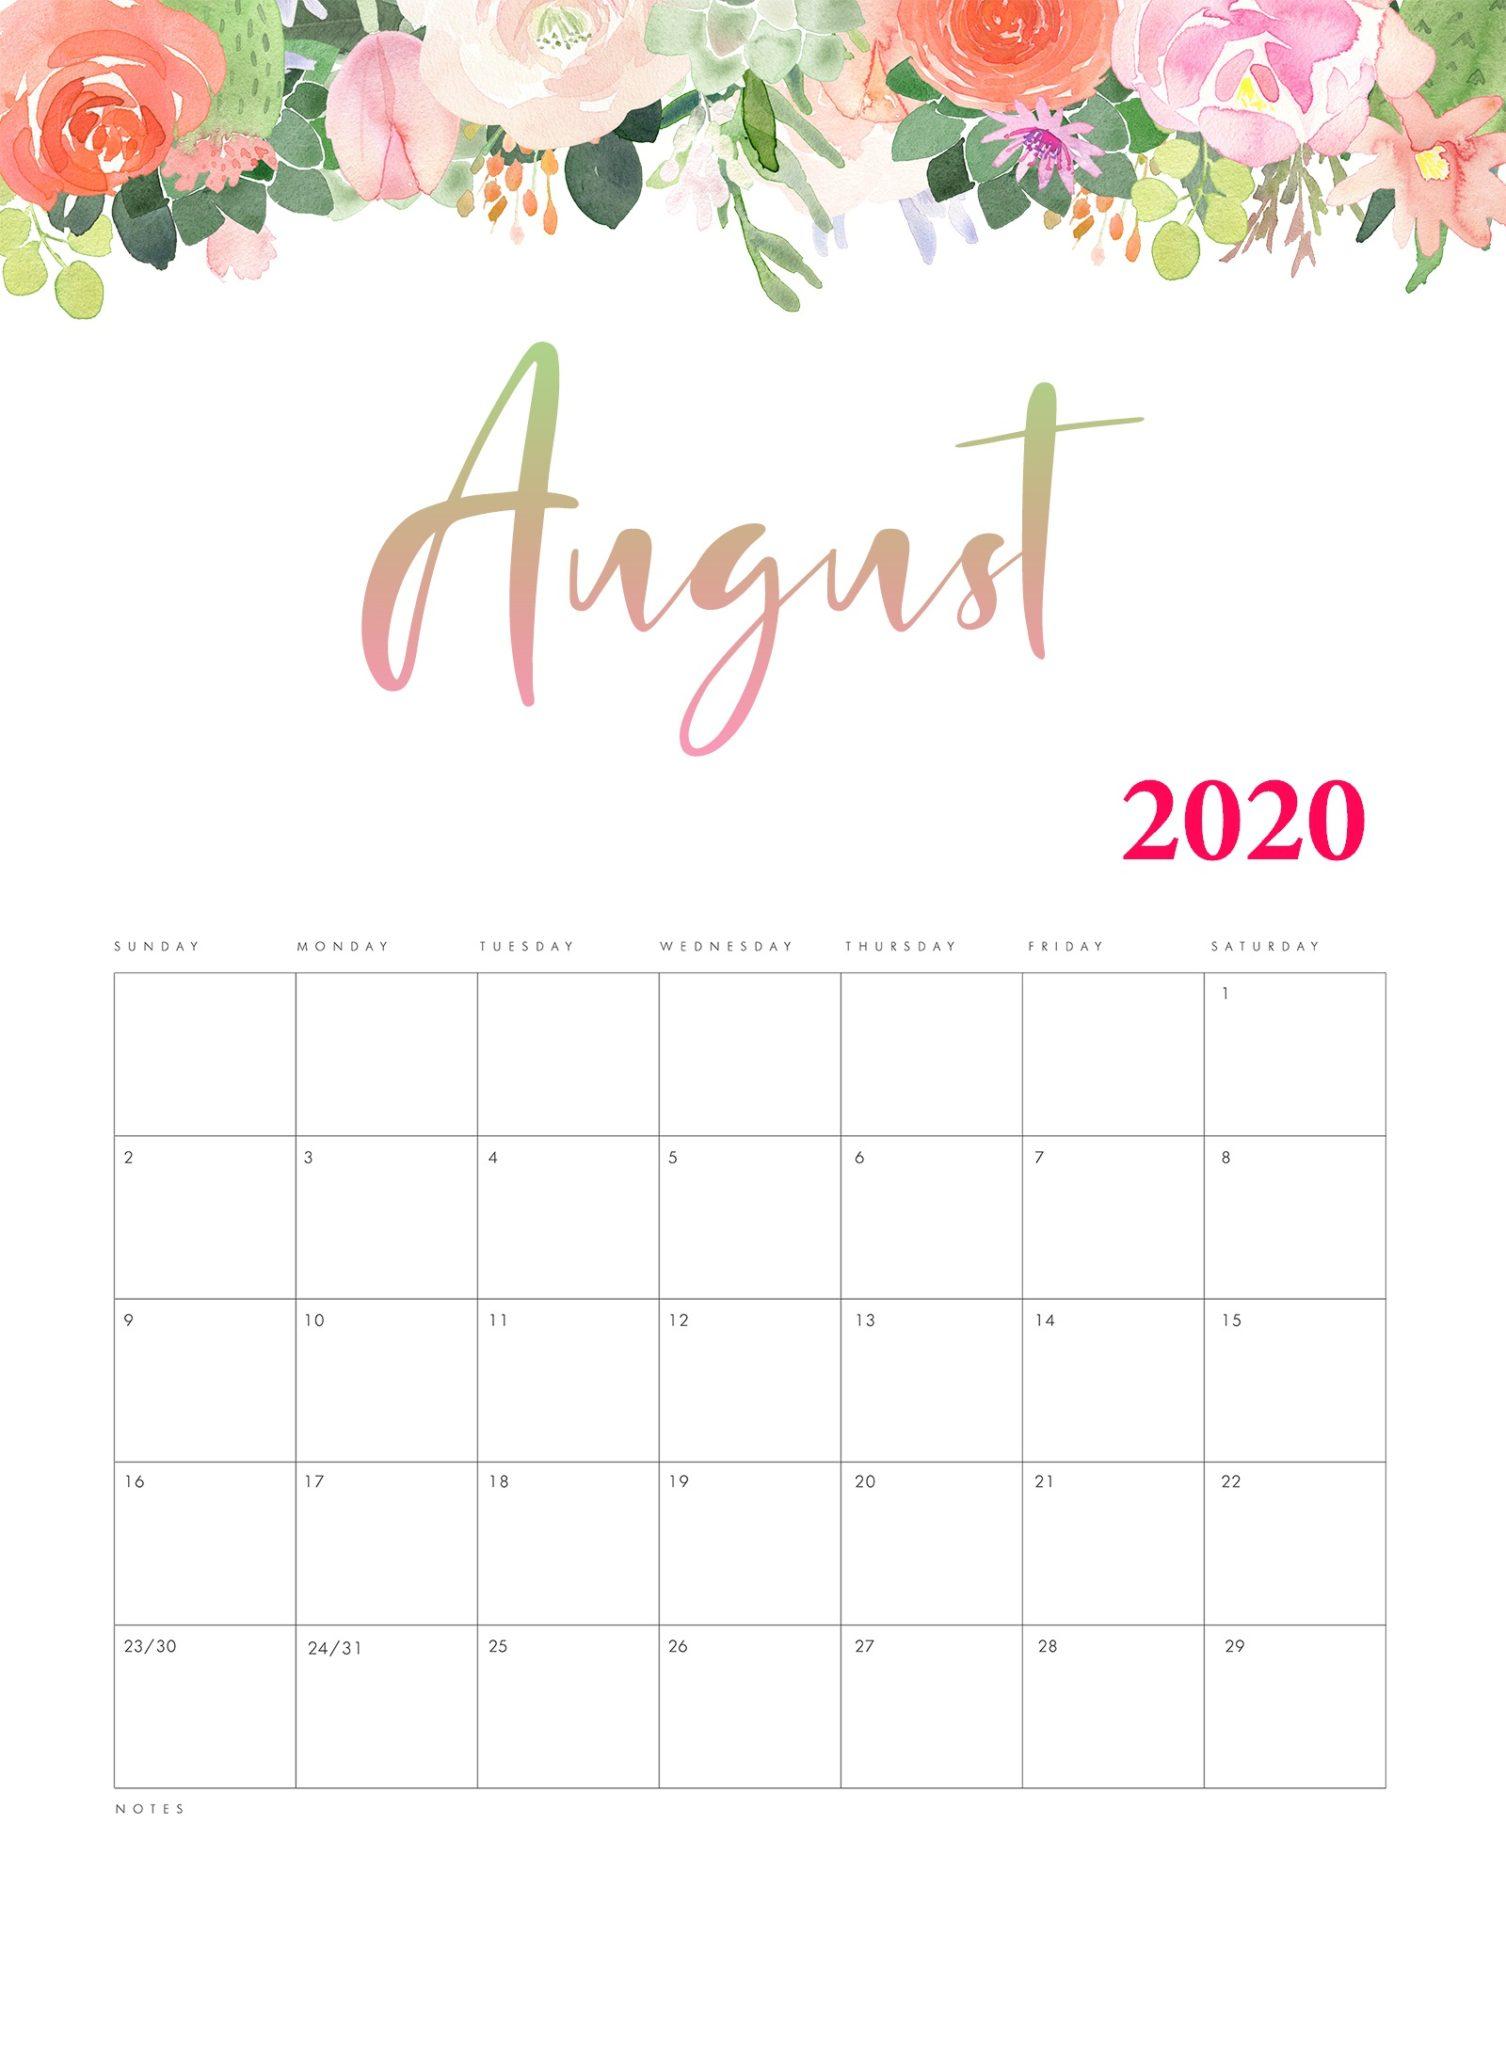 Download August 2020 Cute Calendar